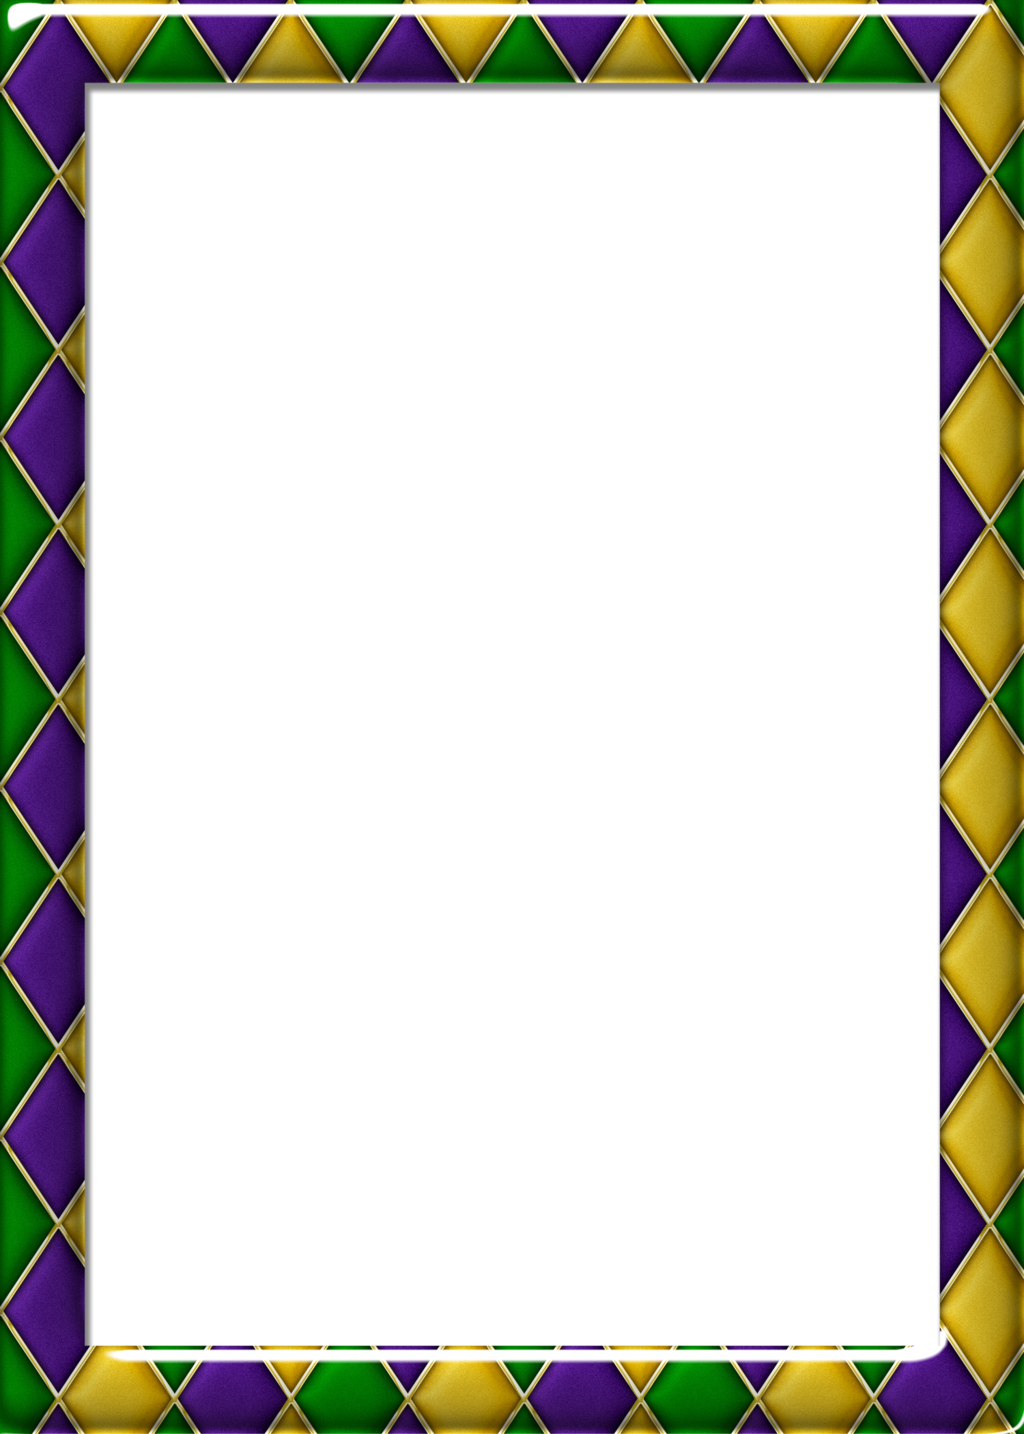 Free x harlequin pattern. Mardi gras border png